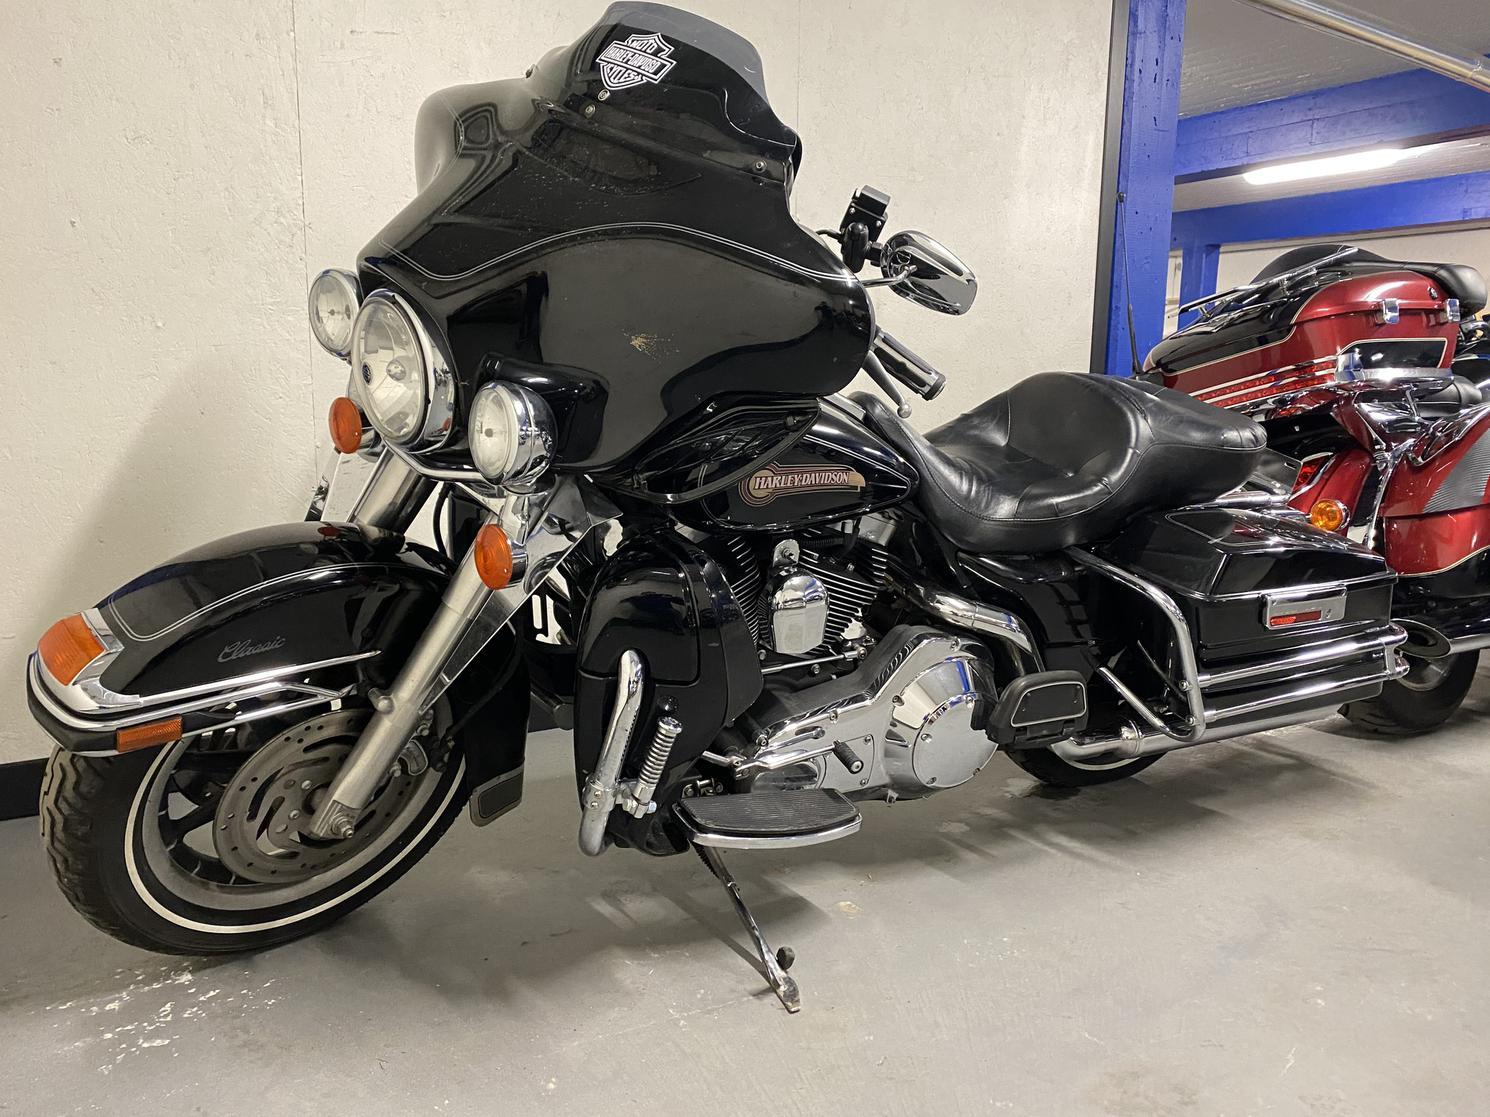 2006 Harley-davidson FLHTCI ELECTRA CLASSIC